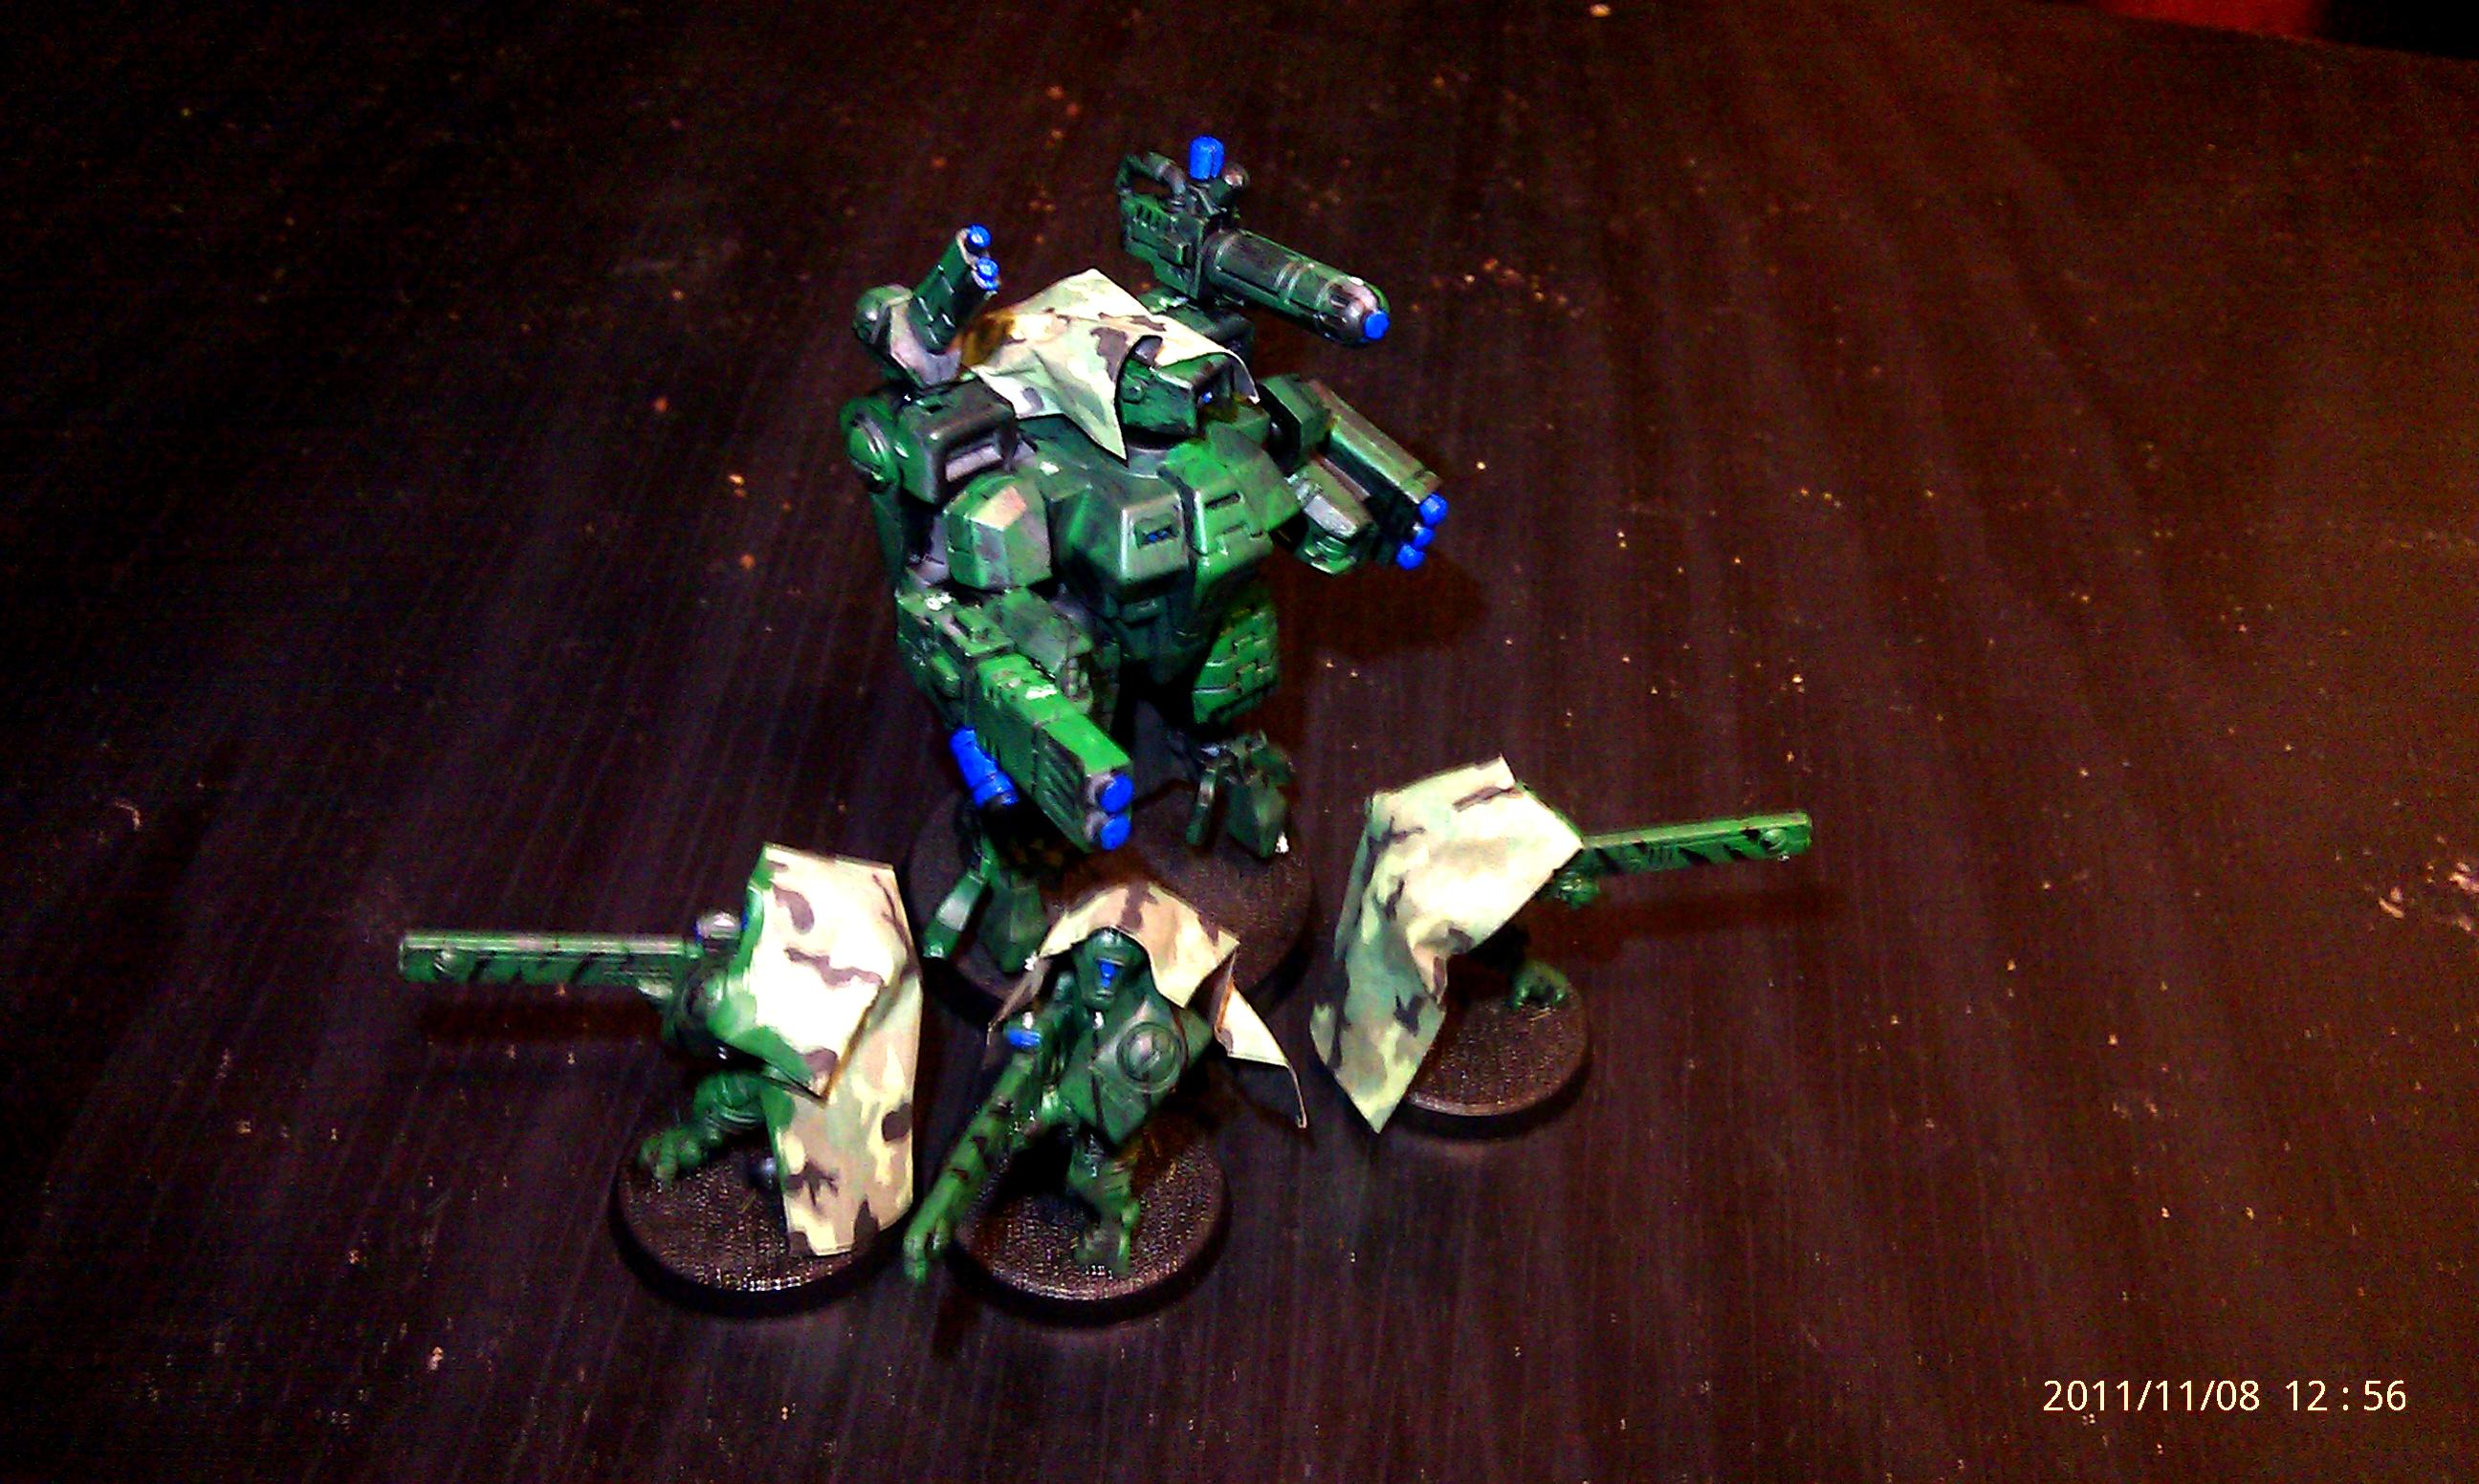 Camouflage, Crisis Battlesuit, Fire Warriors, Tau Empire, Warhammer 40,000